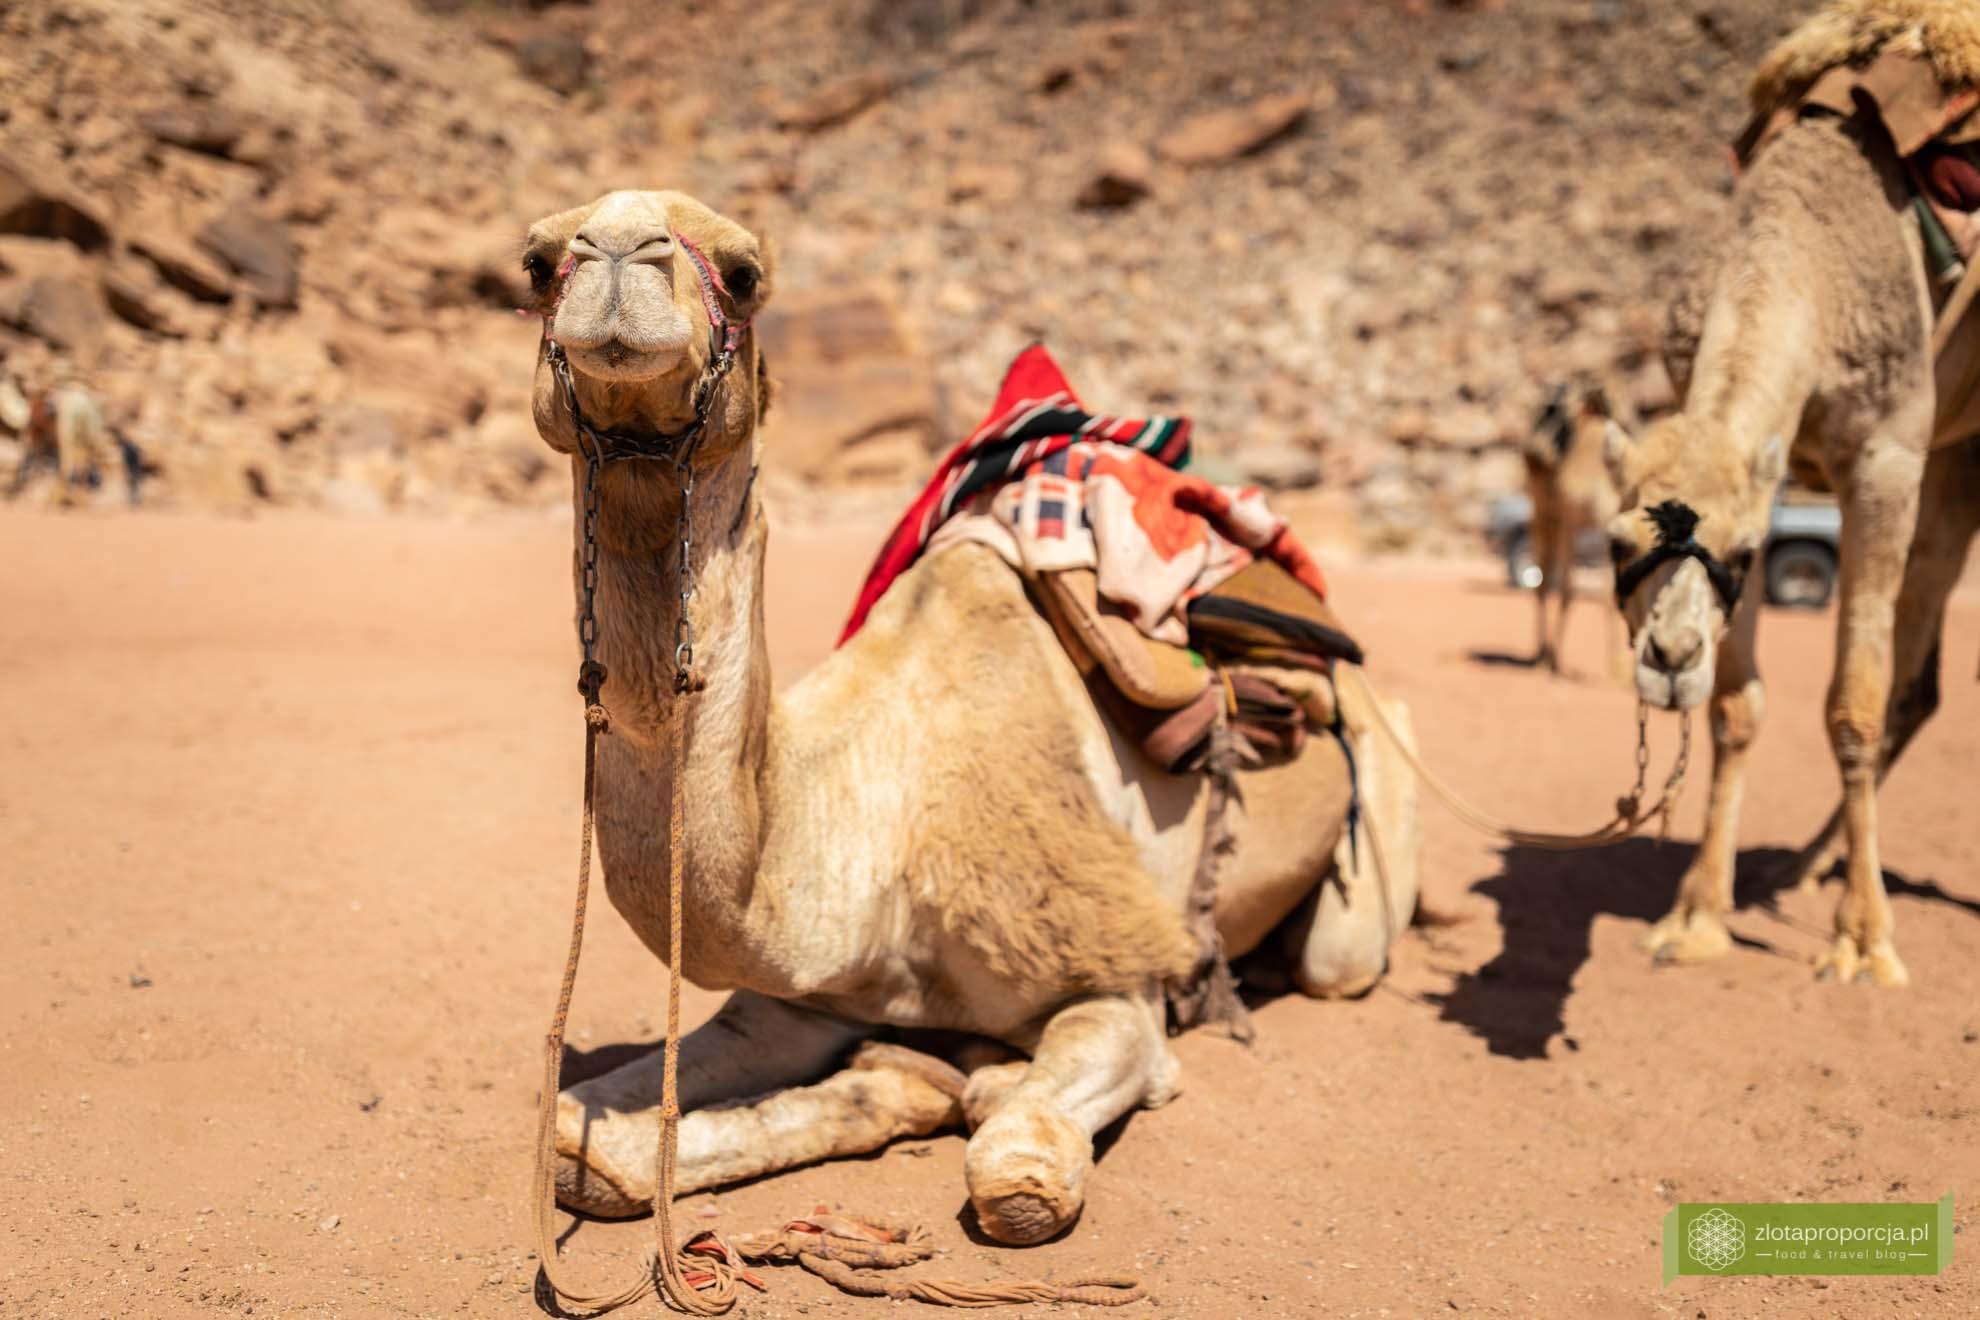 Wadi Rum, pustynia Wadi Rum, Jordania, pustynia Jordania; Wadi rum wycieczka, Wadi Rum zwiedzanie, Jordania atrakcje; wielbłąd;